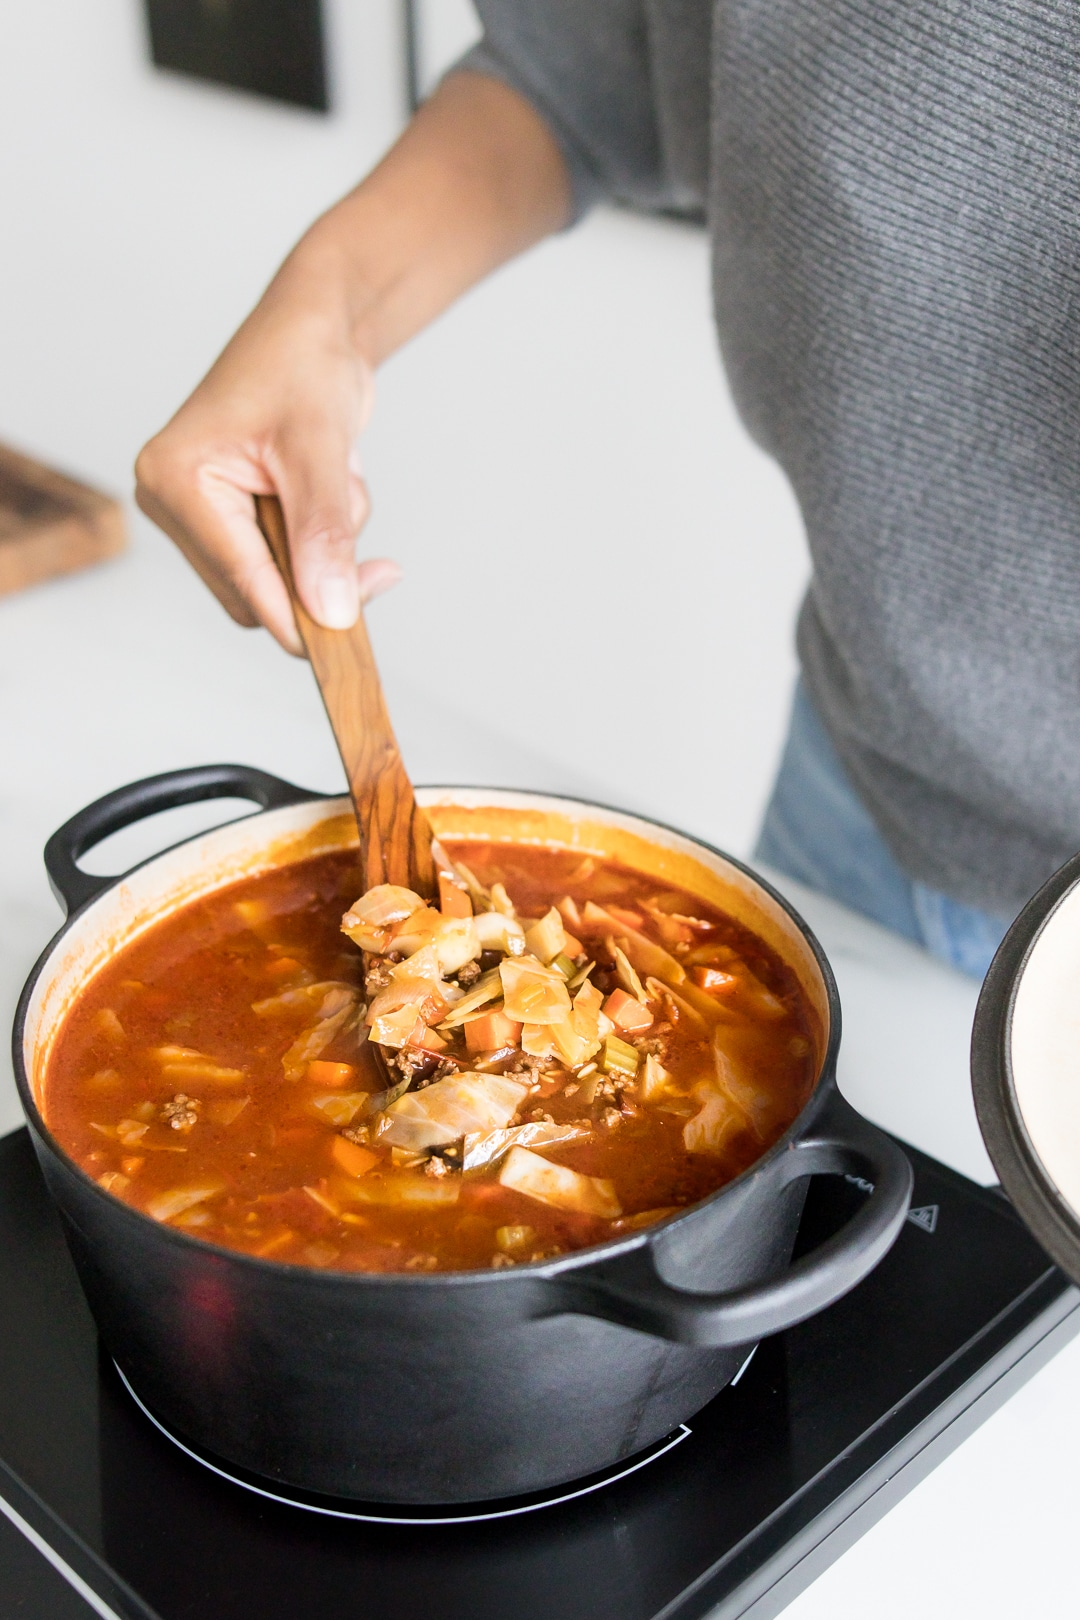 Mystique stirring cabbage roll soup in a black dutch oven pot.